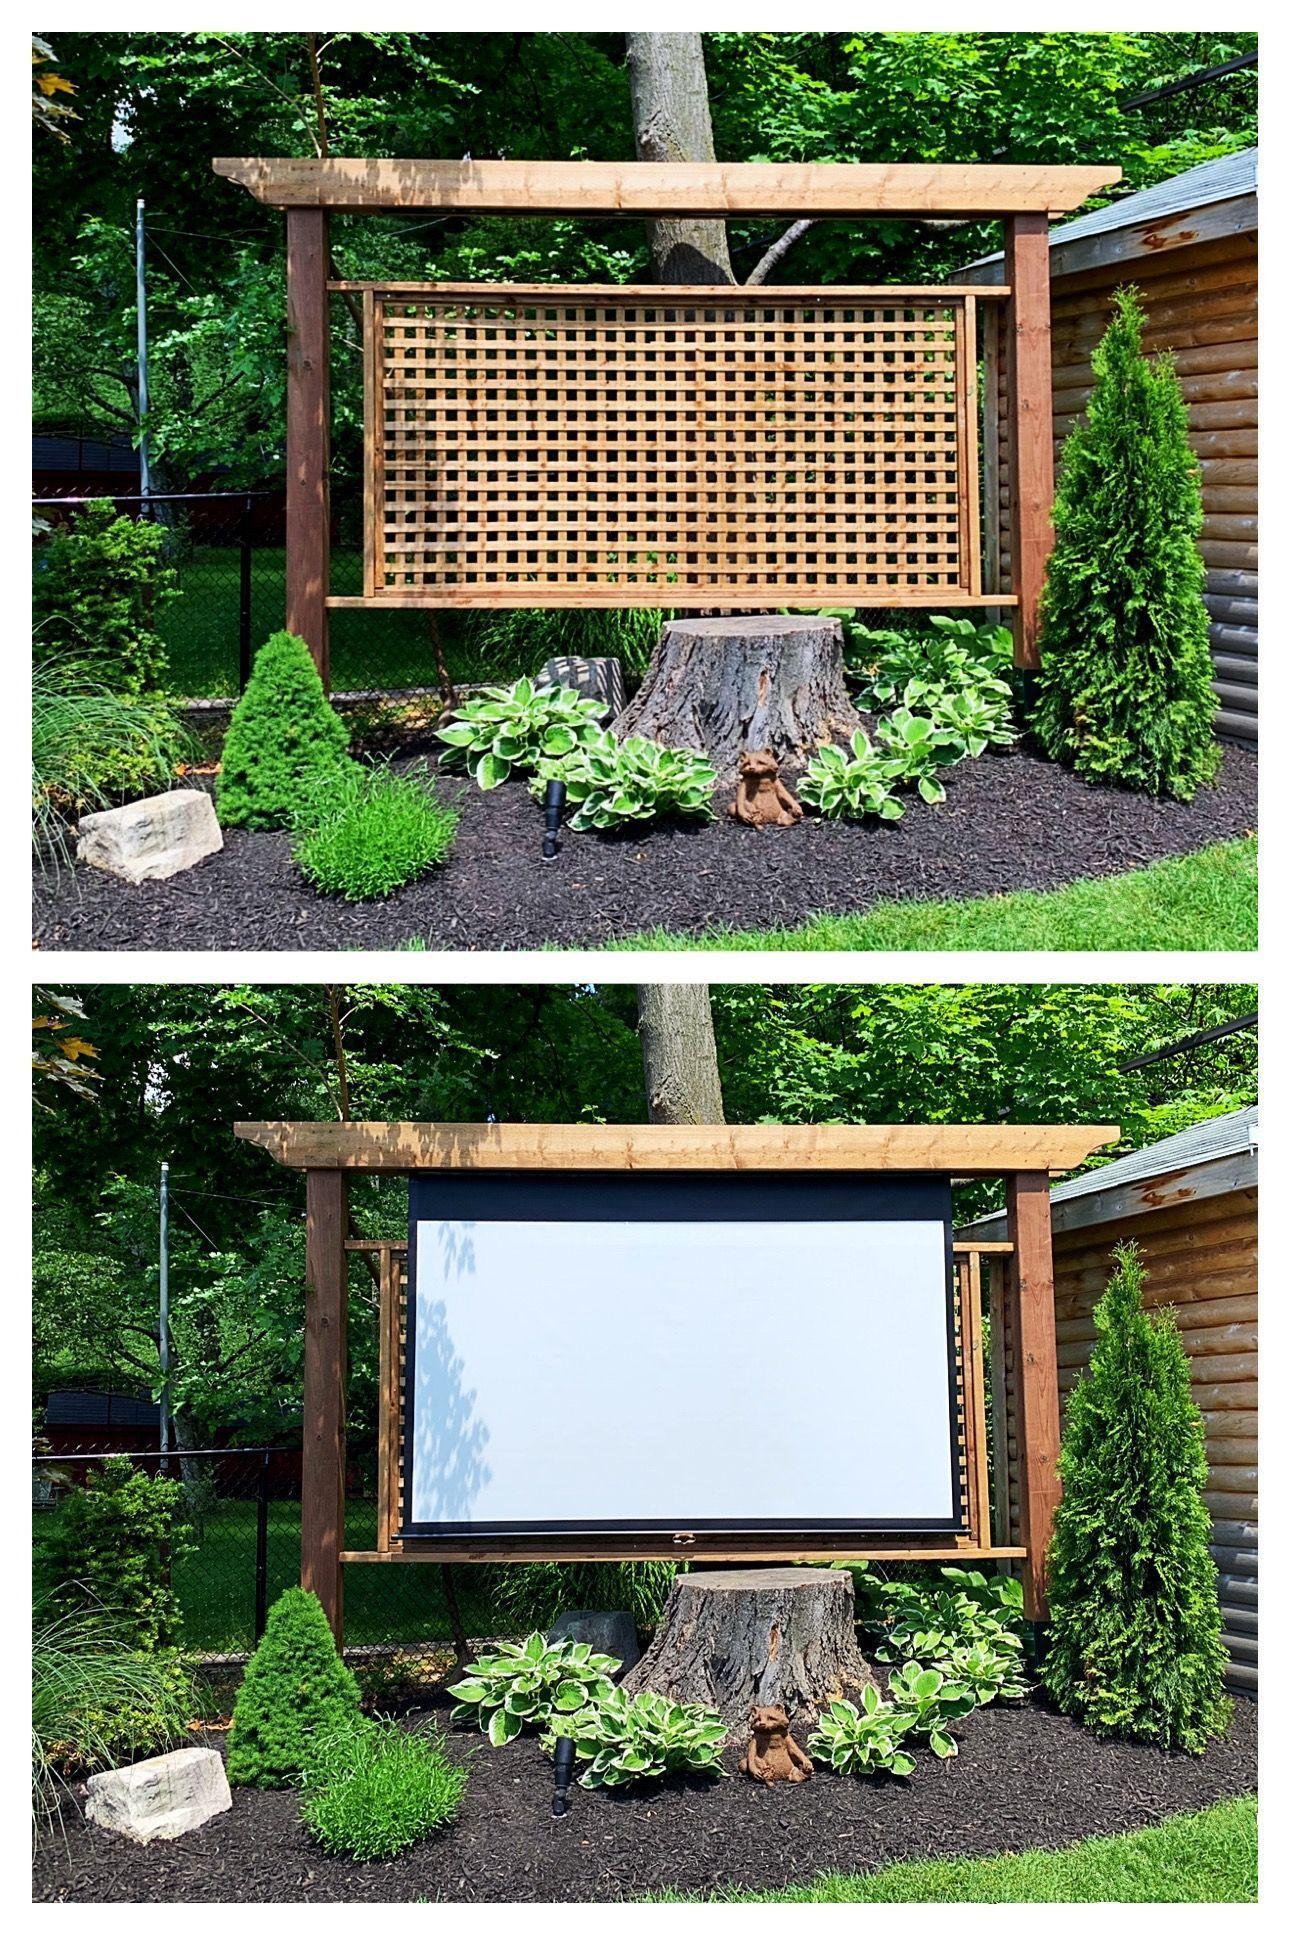 Garden Privacy Screen With Hidden Roll Down Movie Screen Modern Design Garden Privacy Screen Diy Outdoor Movie Screen Garden Privacy